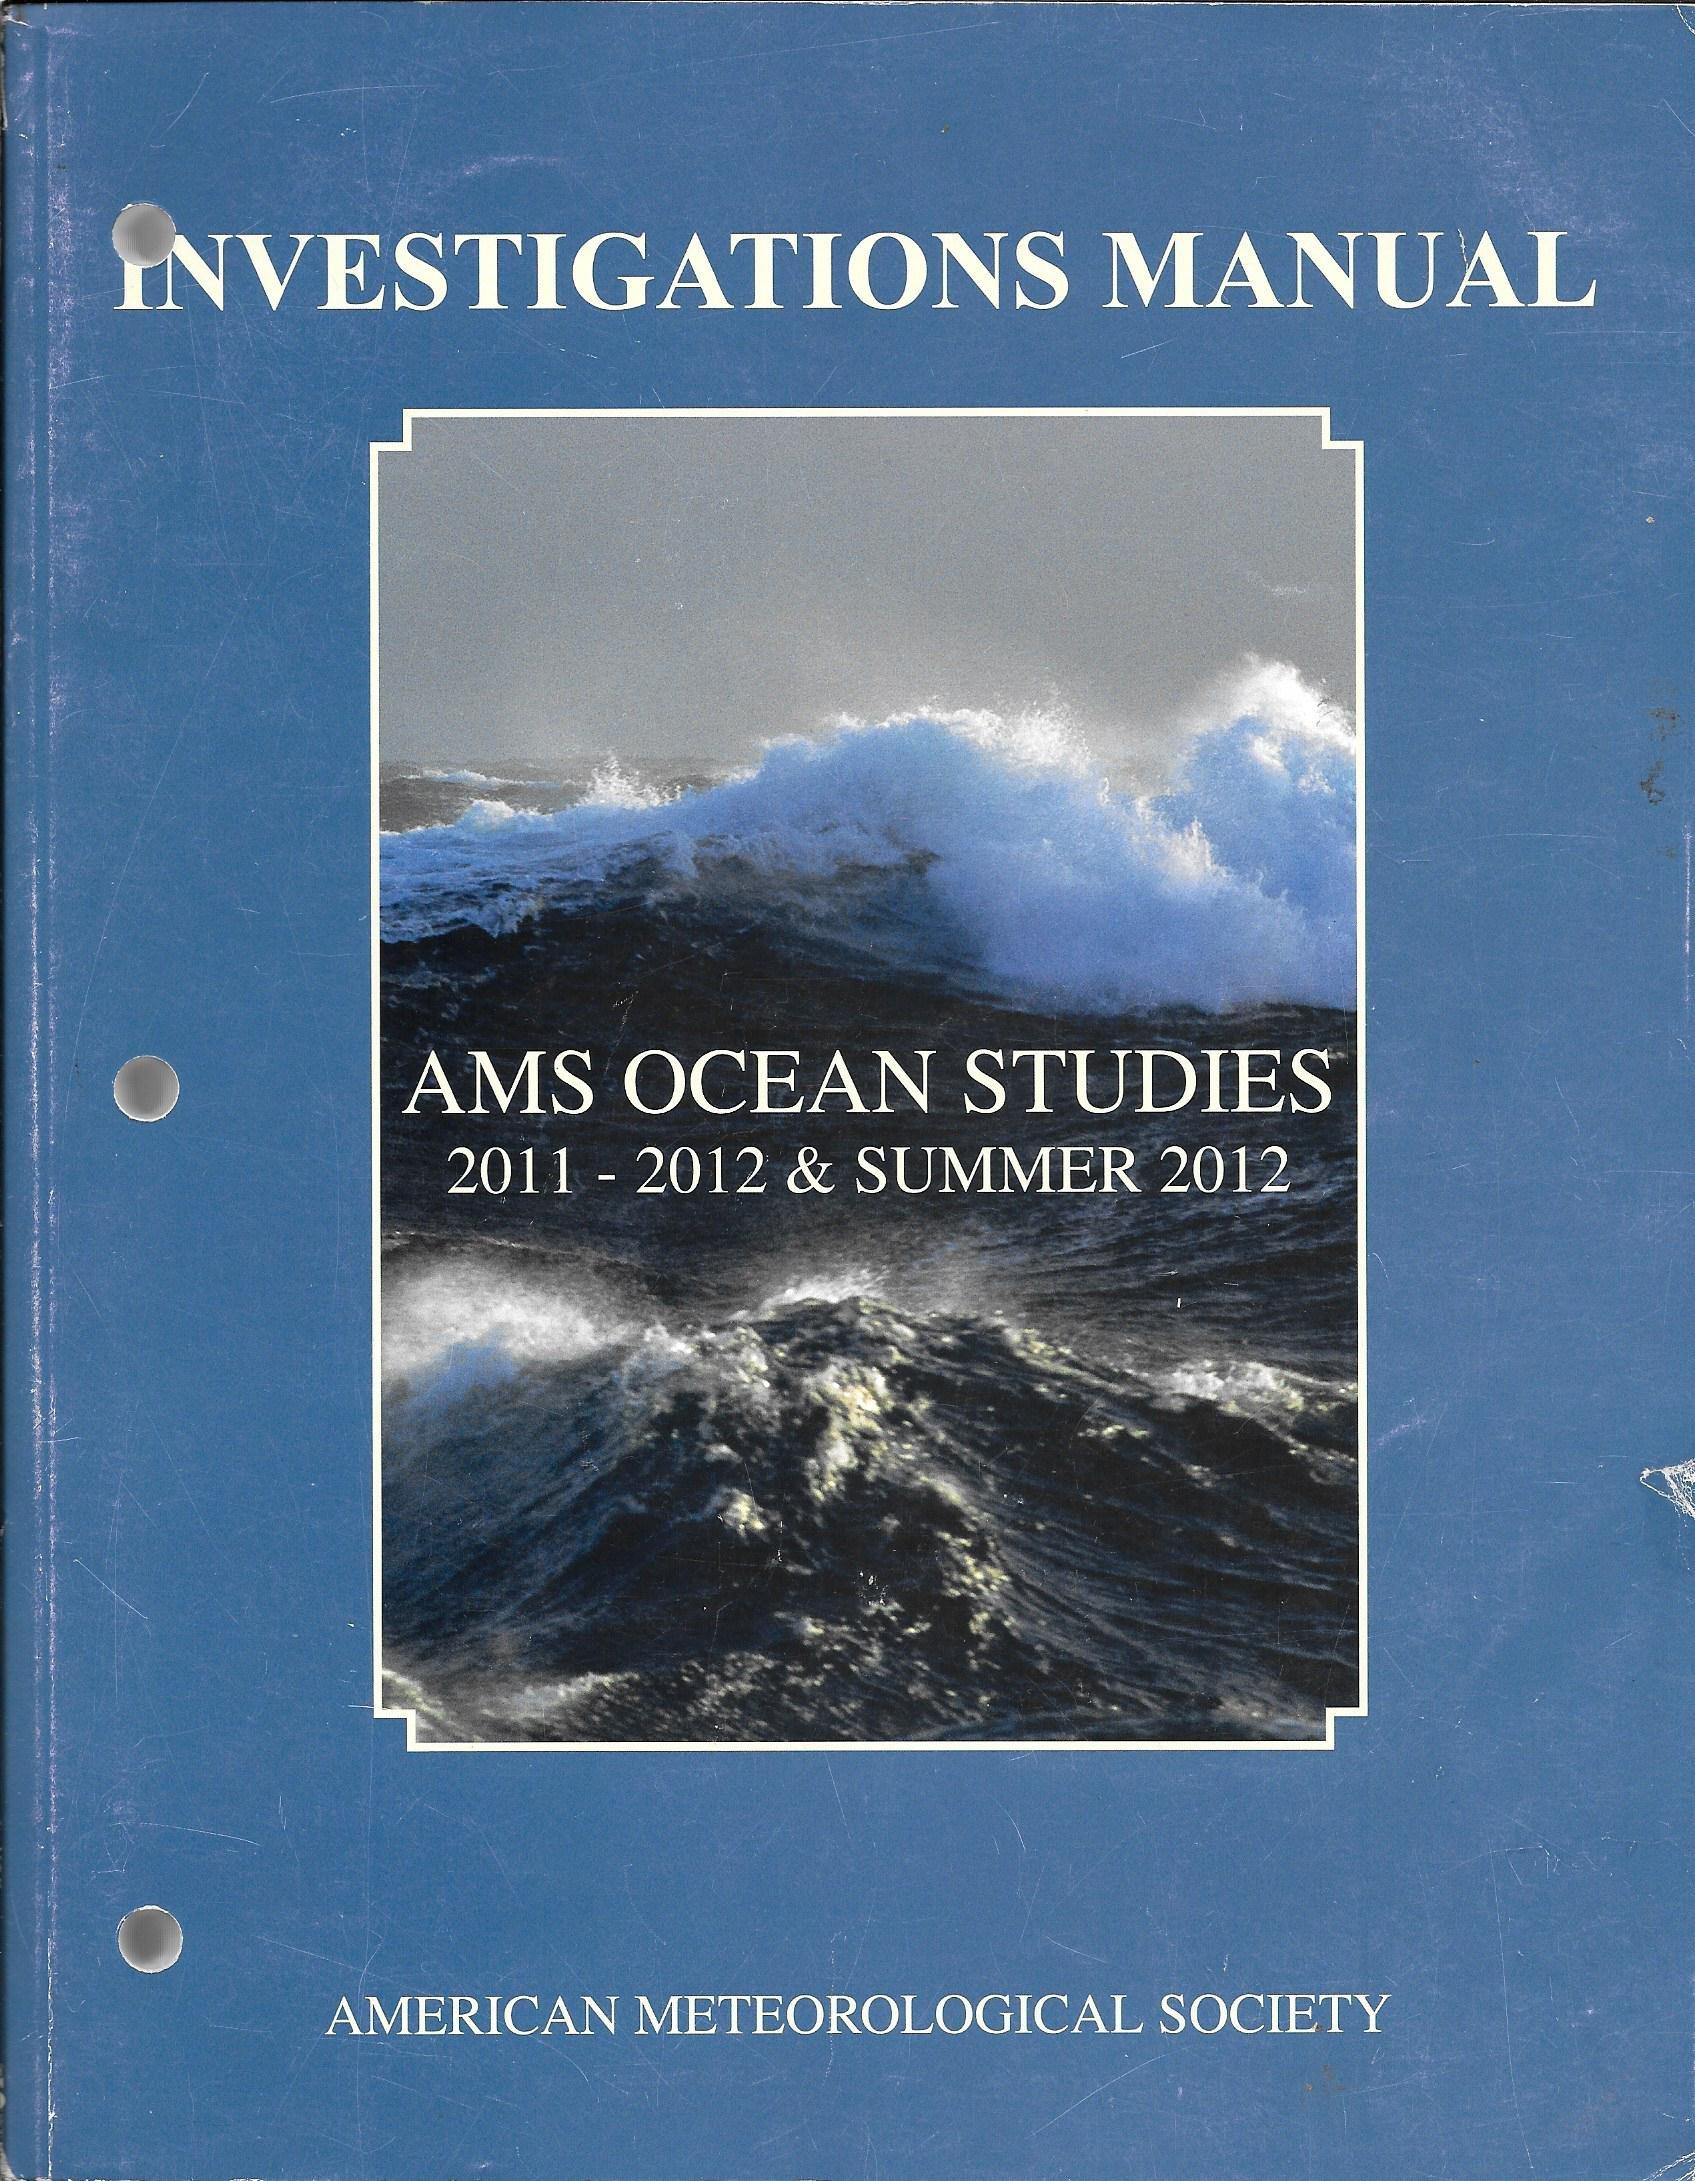 AMS Ocean Studies Investigations Manual - 2011-2012 & Summer 2012: American  Meteorological Society: 9781878220516: Amazon.com: Books